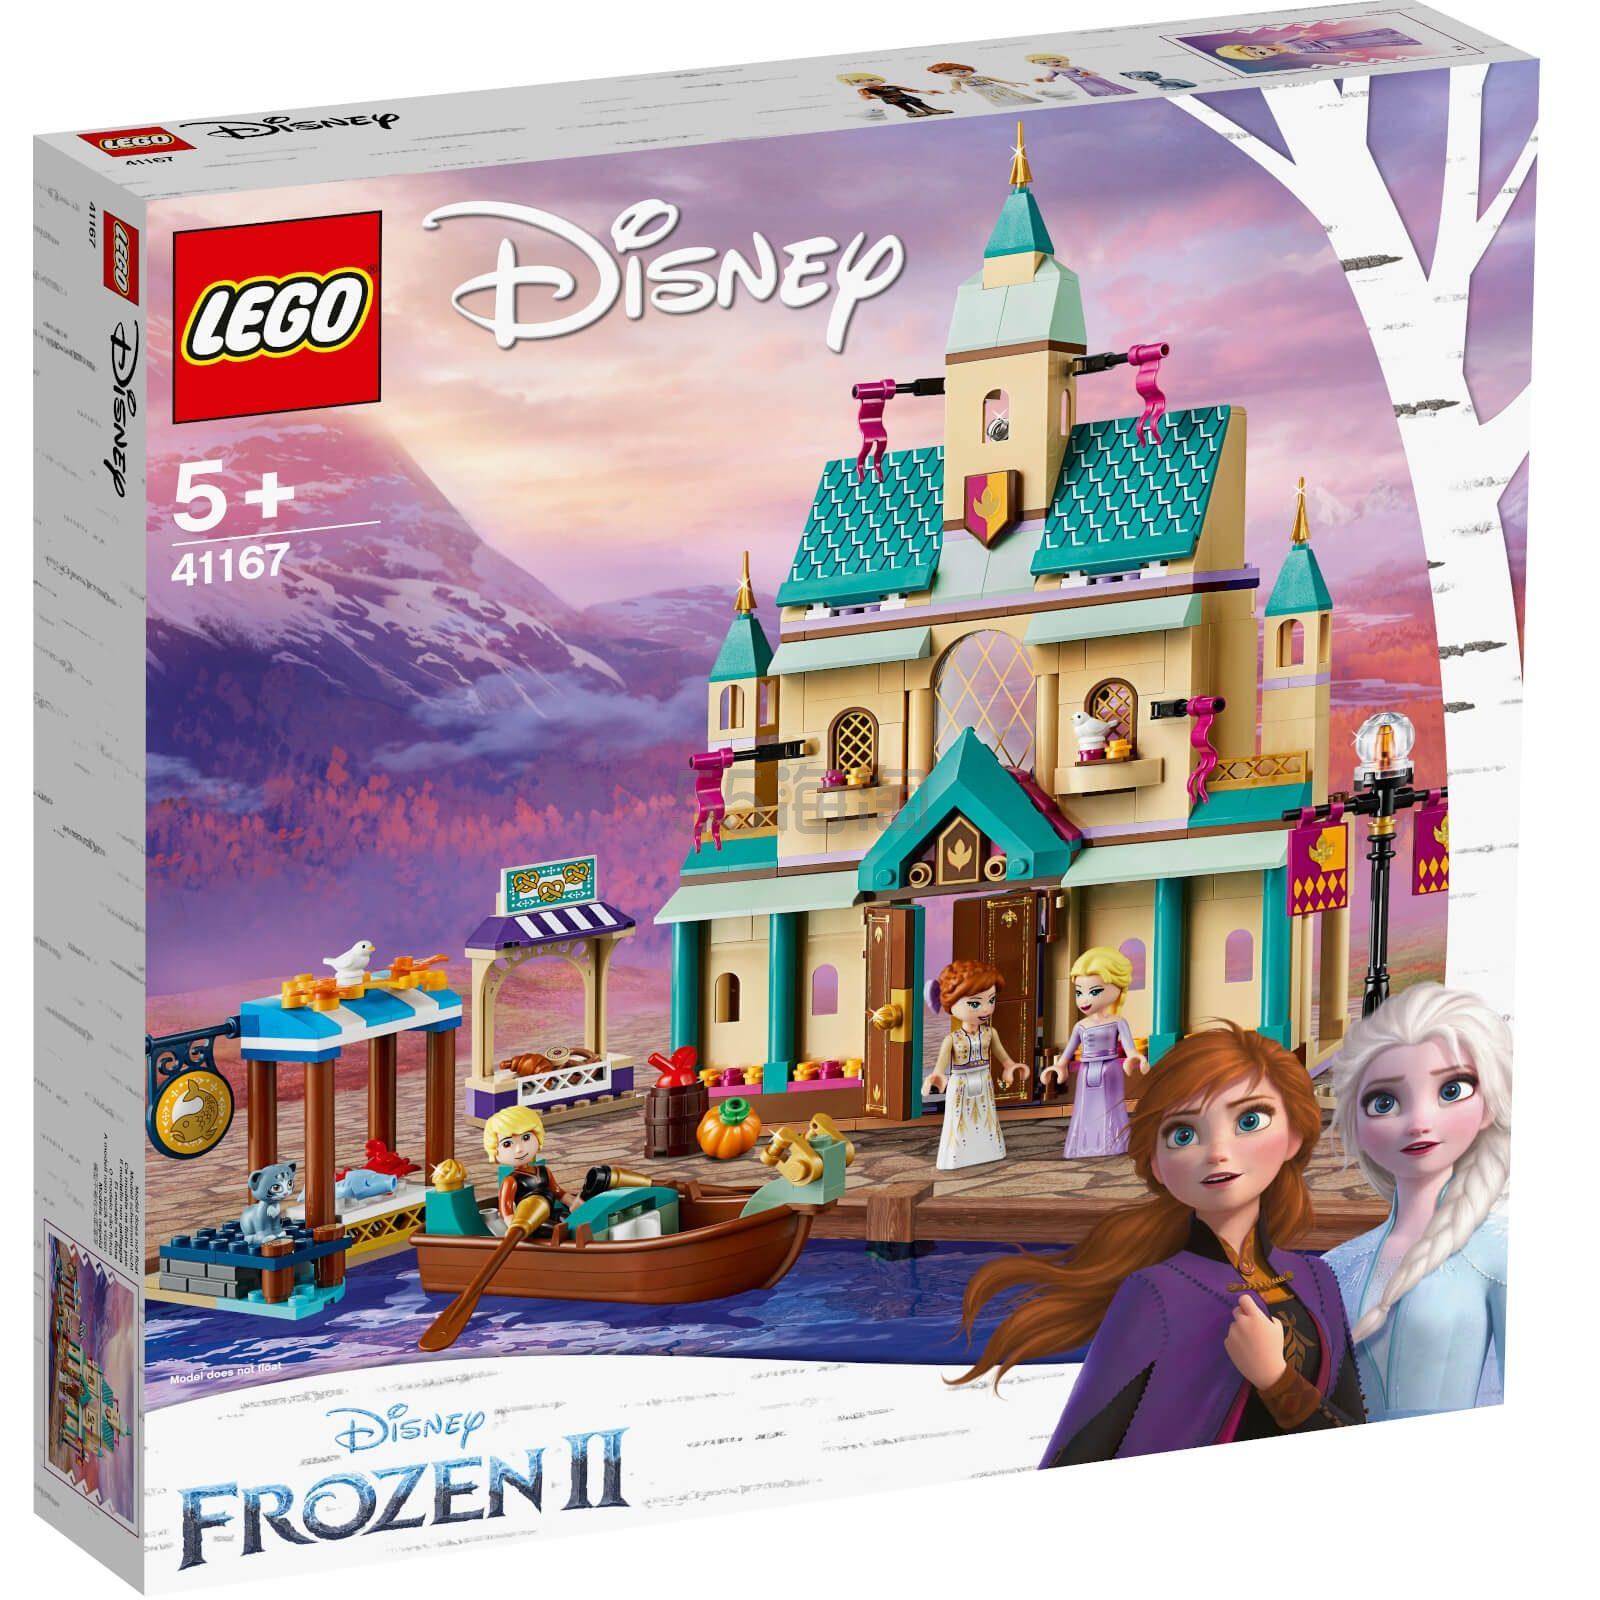 LEGO 乐高 迪士尼系列 阿伦戴尔城堡村庄 (41167)